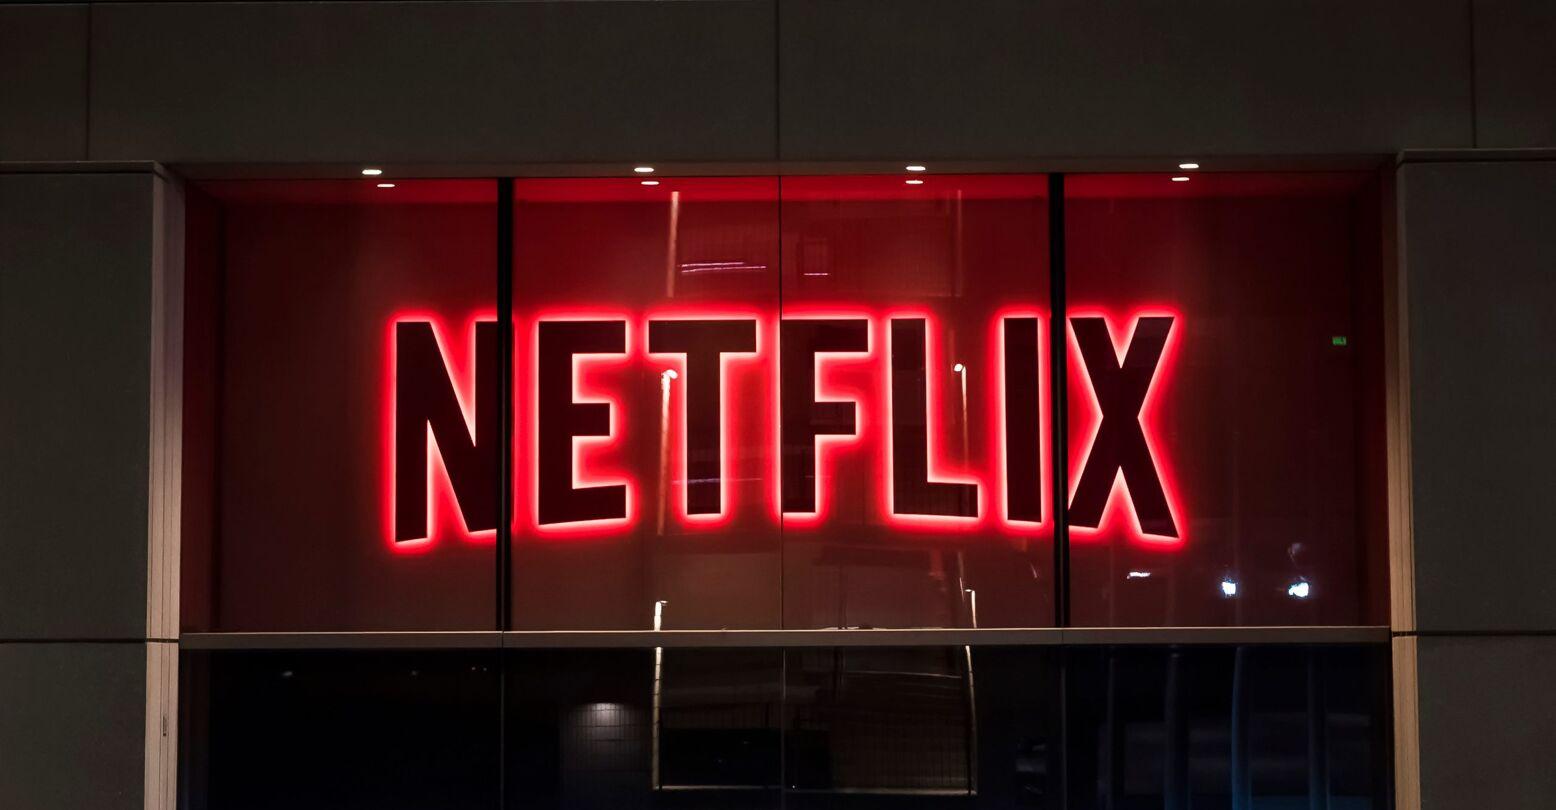 Netflix logo on building